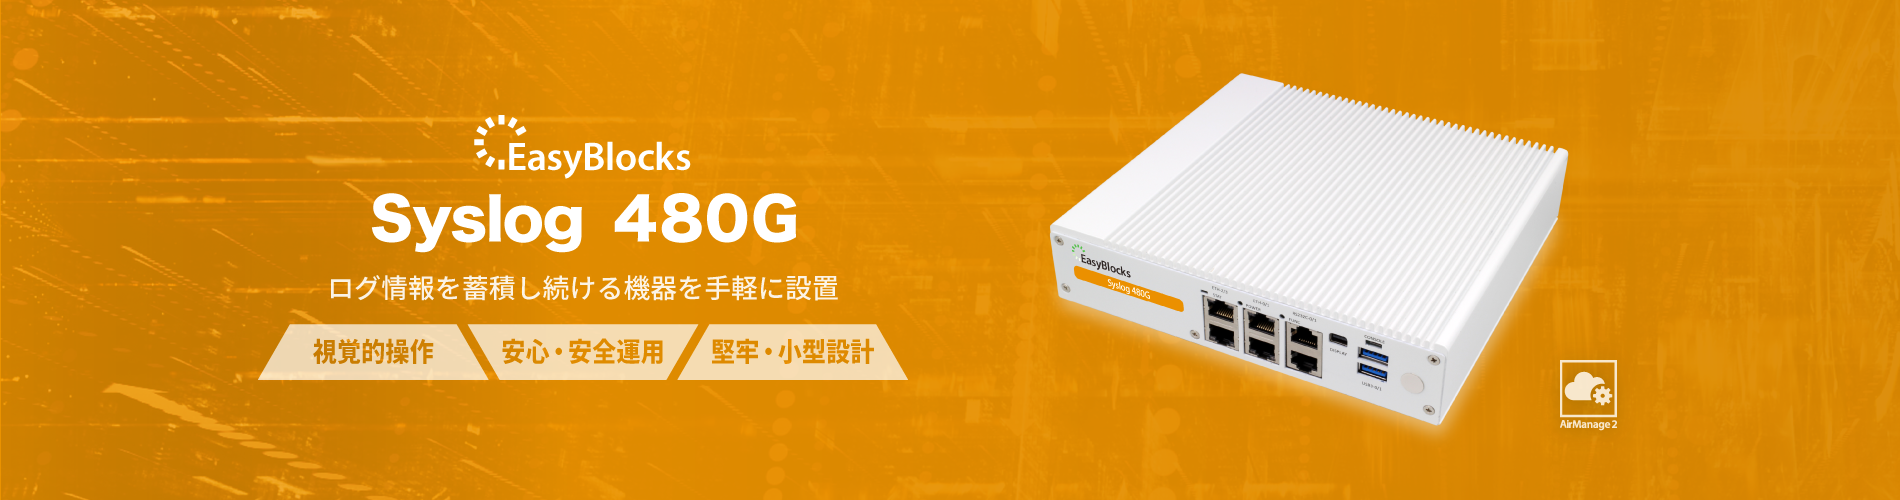 EasyBlocks Syslog 480G ログ情報を蓄積し続ける機器を手軽に設置 視覚的操作 安心・安全運用 堅牢・小型設計